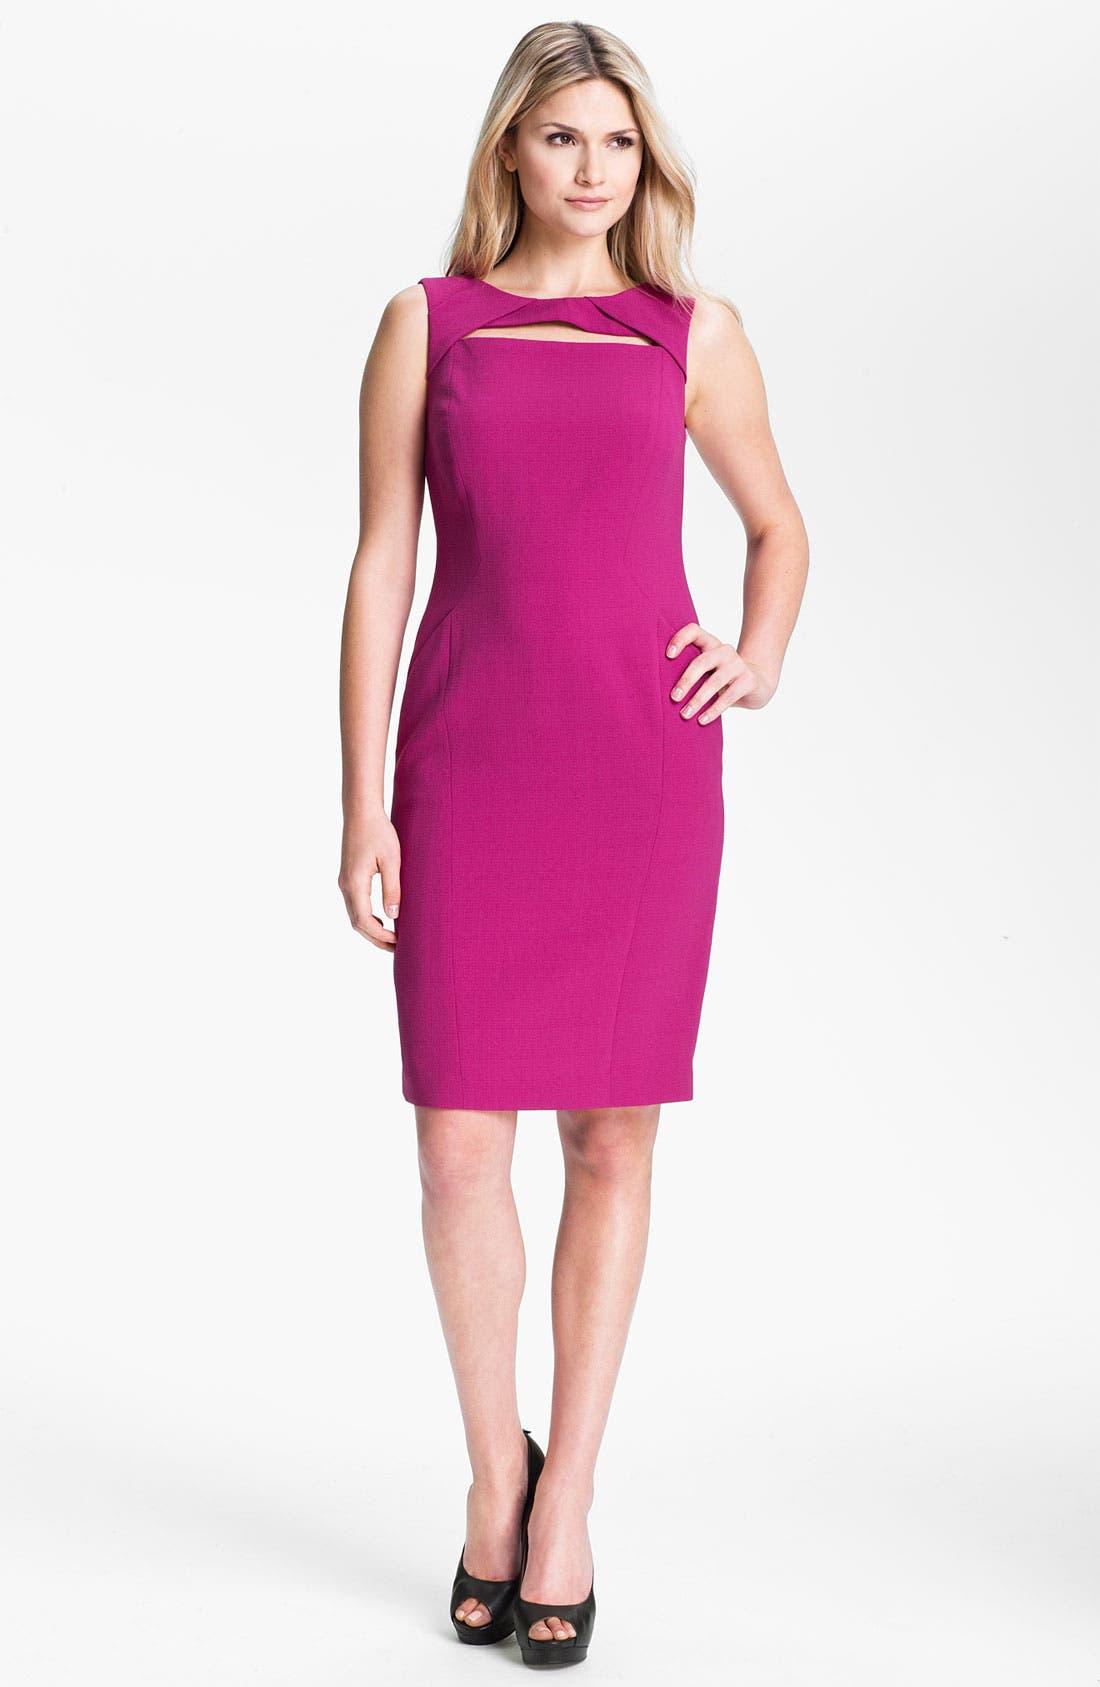 Alternate Image 1 Selected - Anne Klein Sleeveless Sheath Dress